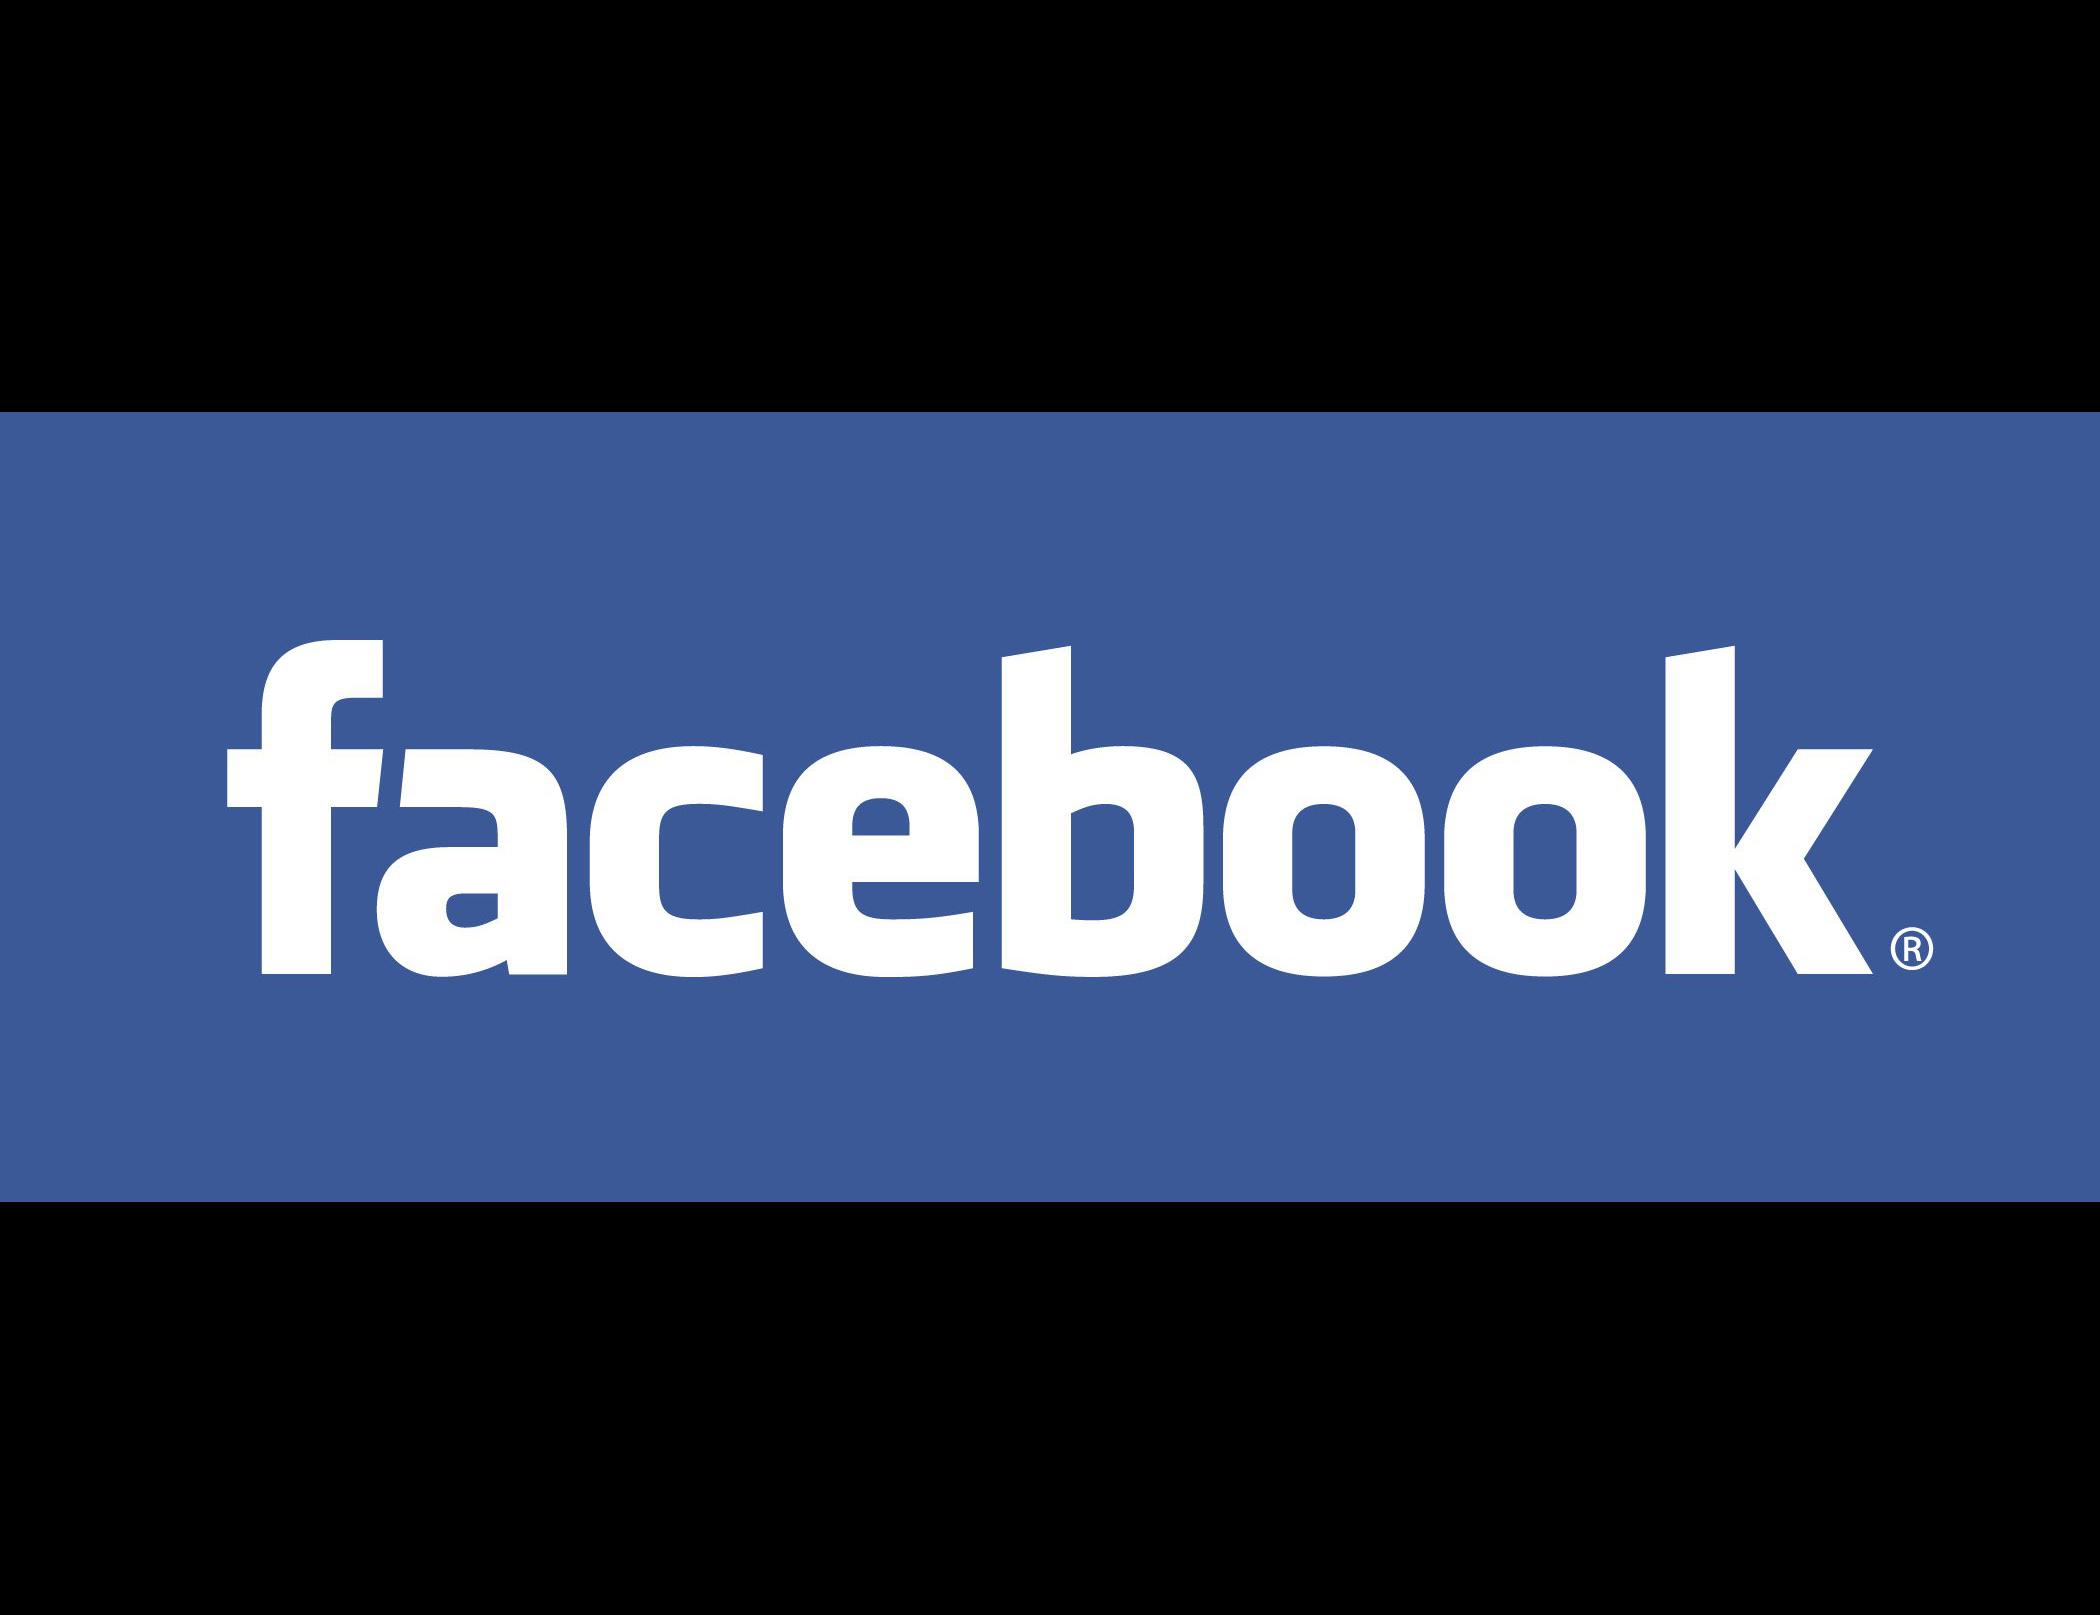 Png . Clipart logo facebook